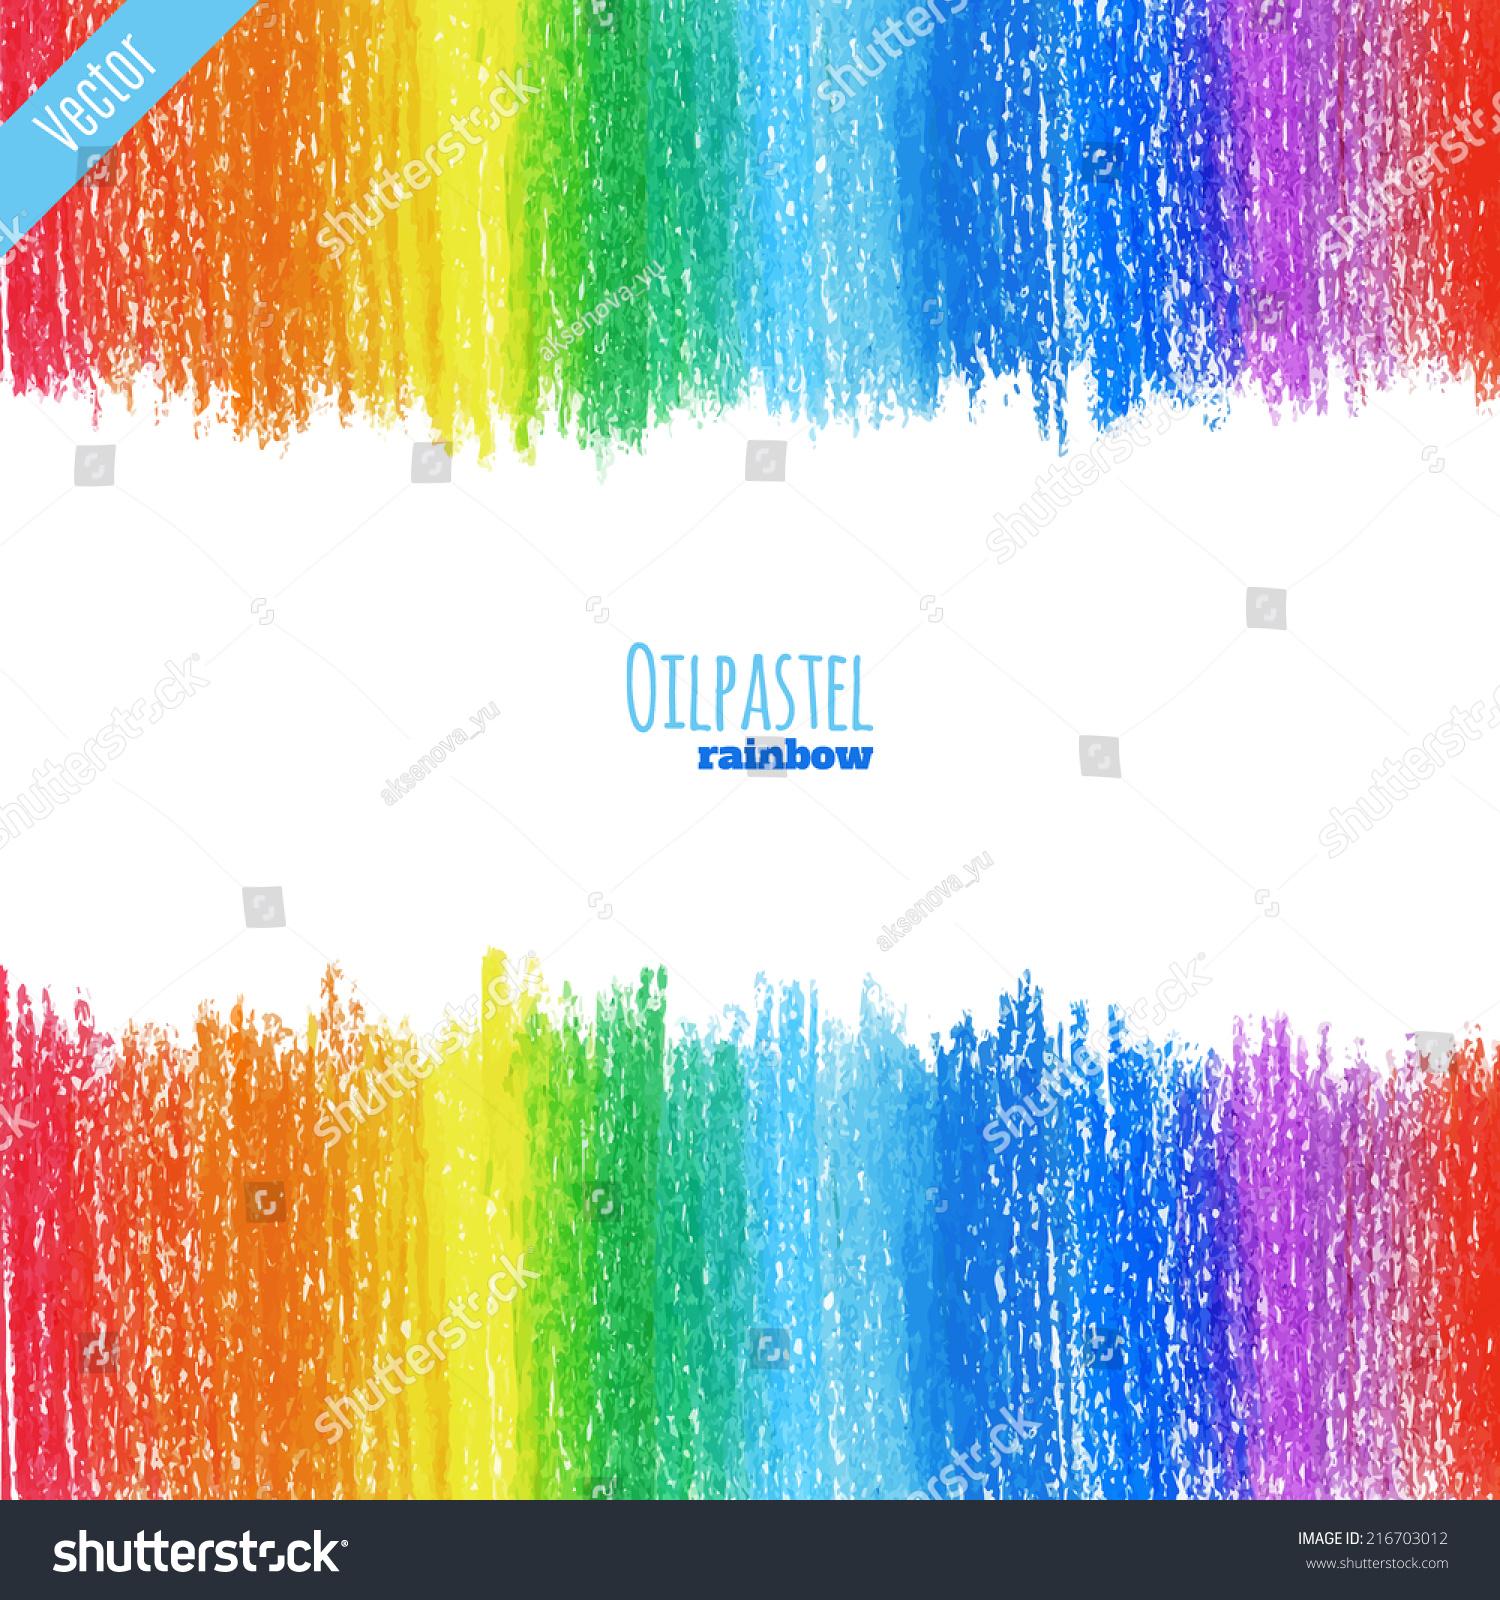 Handpaint Oil Pastel Rainbow Background Stock Vector ...